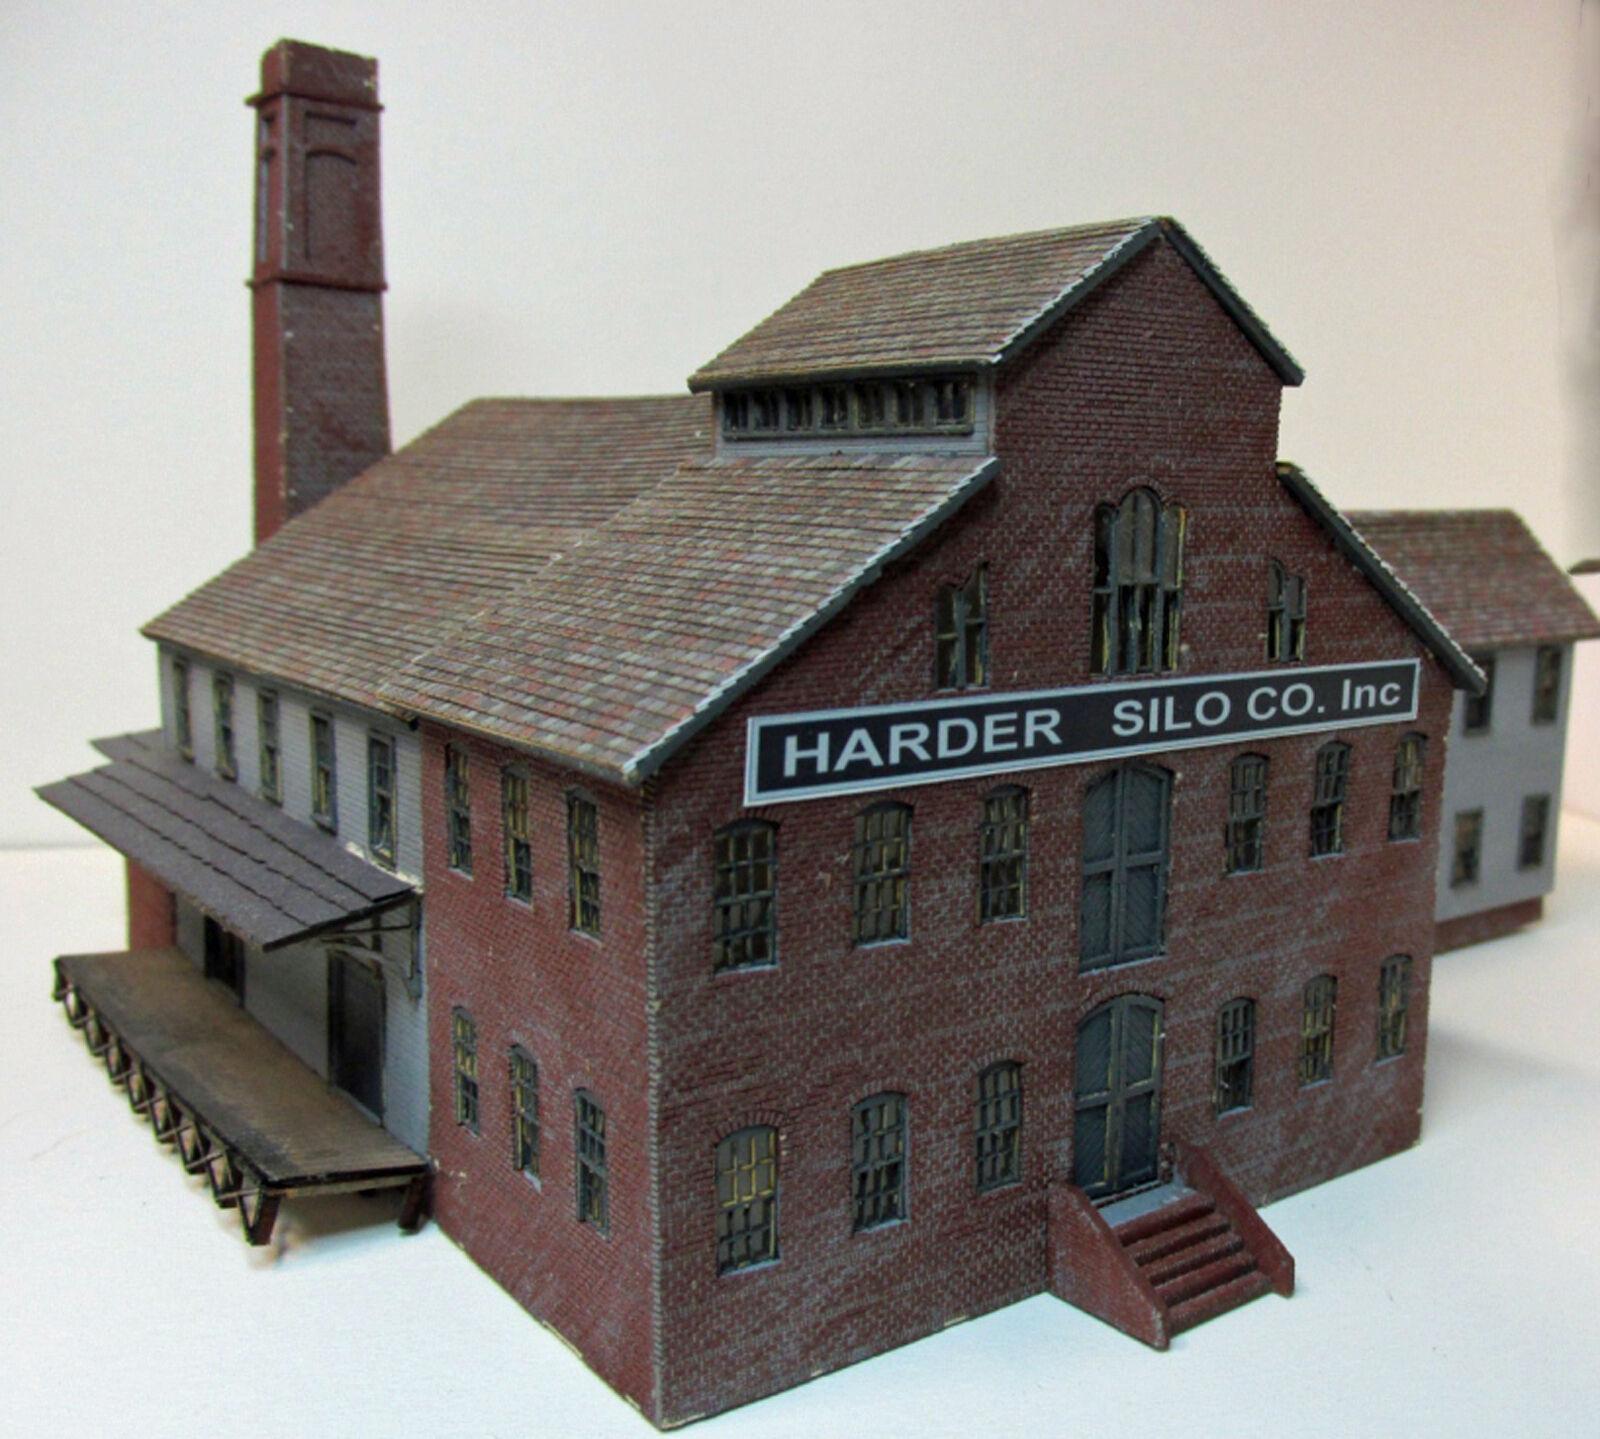 FACTORY BUILDING HO Scale Model Railroad Structure Structure Structure Unptd Wood Laser Kit RSL2057 cd9cb6